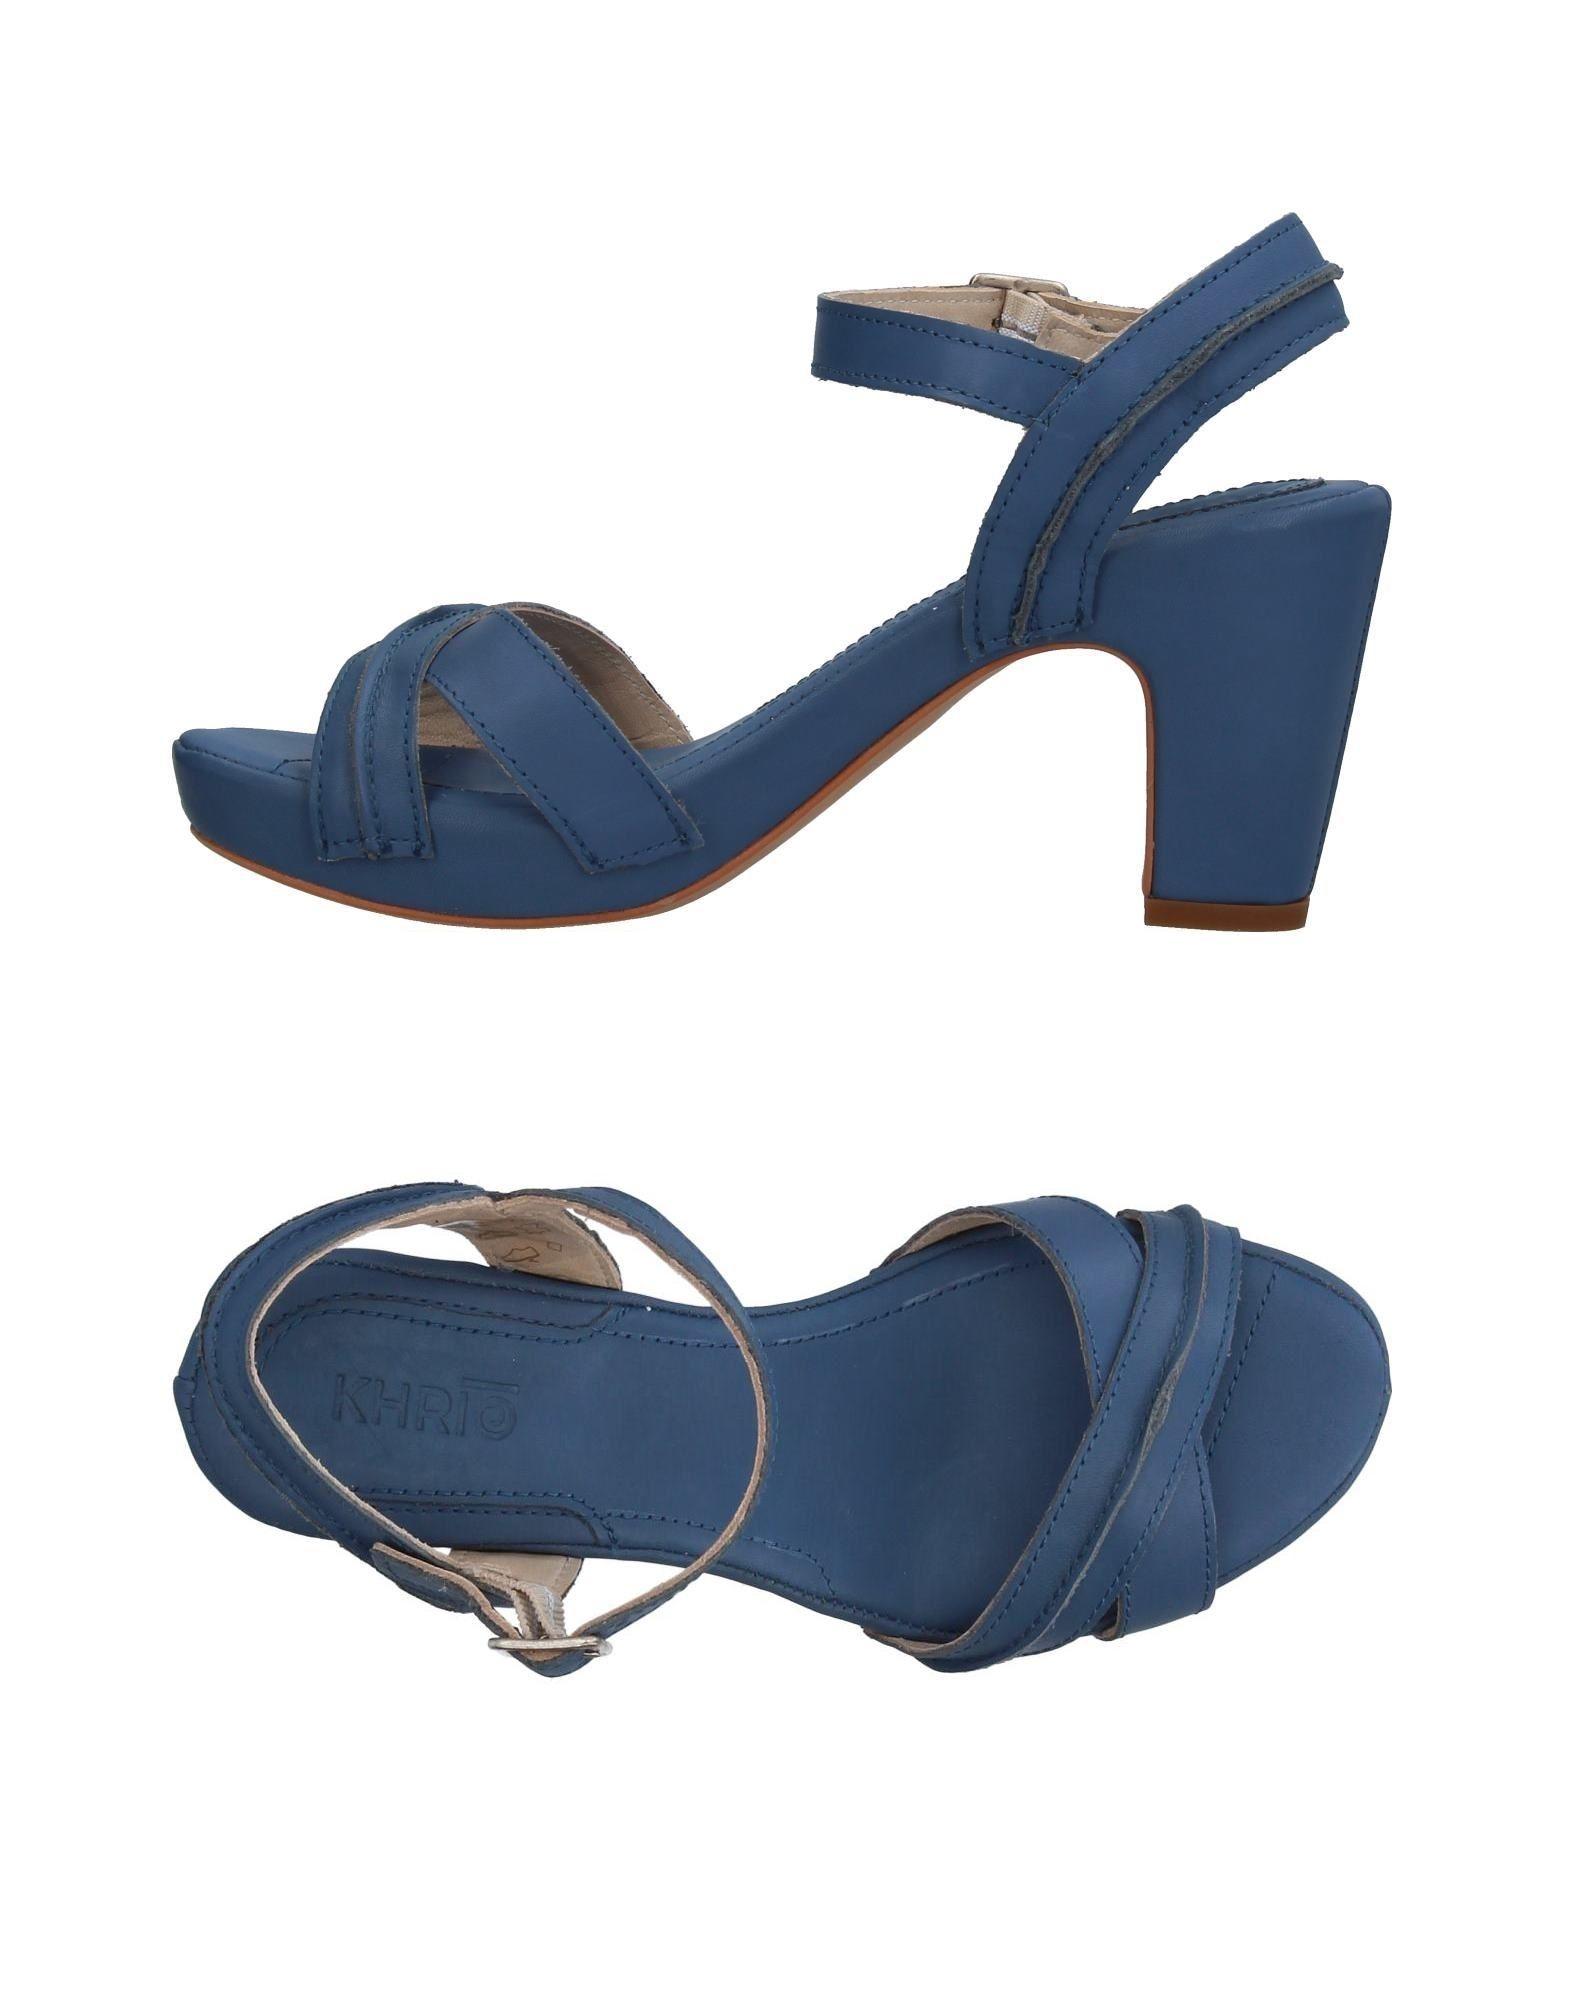 Haltbare Mode billige Schuhe Khrio' Sandalen Damen  11409220JI Heiße Schuhe